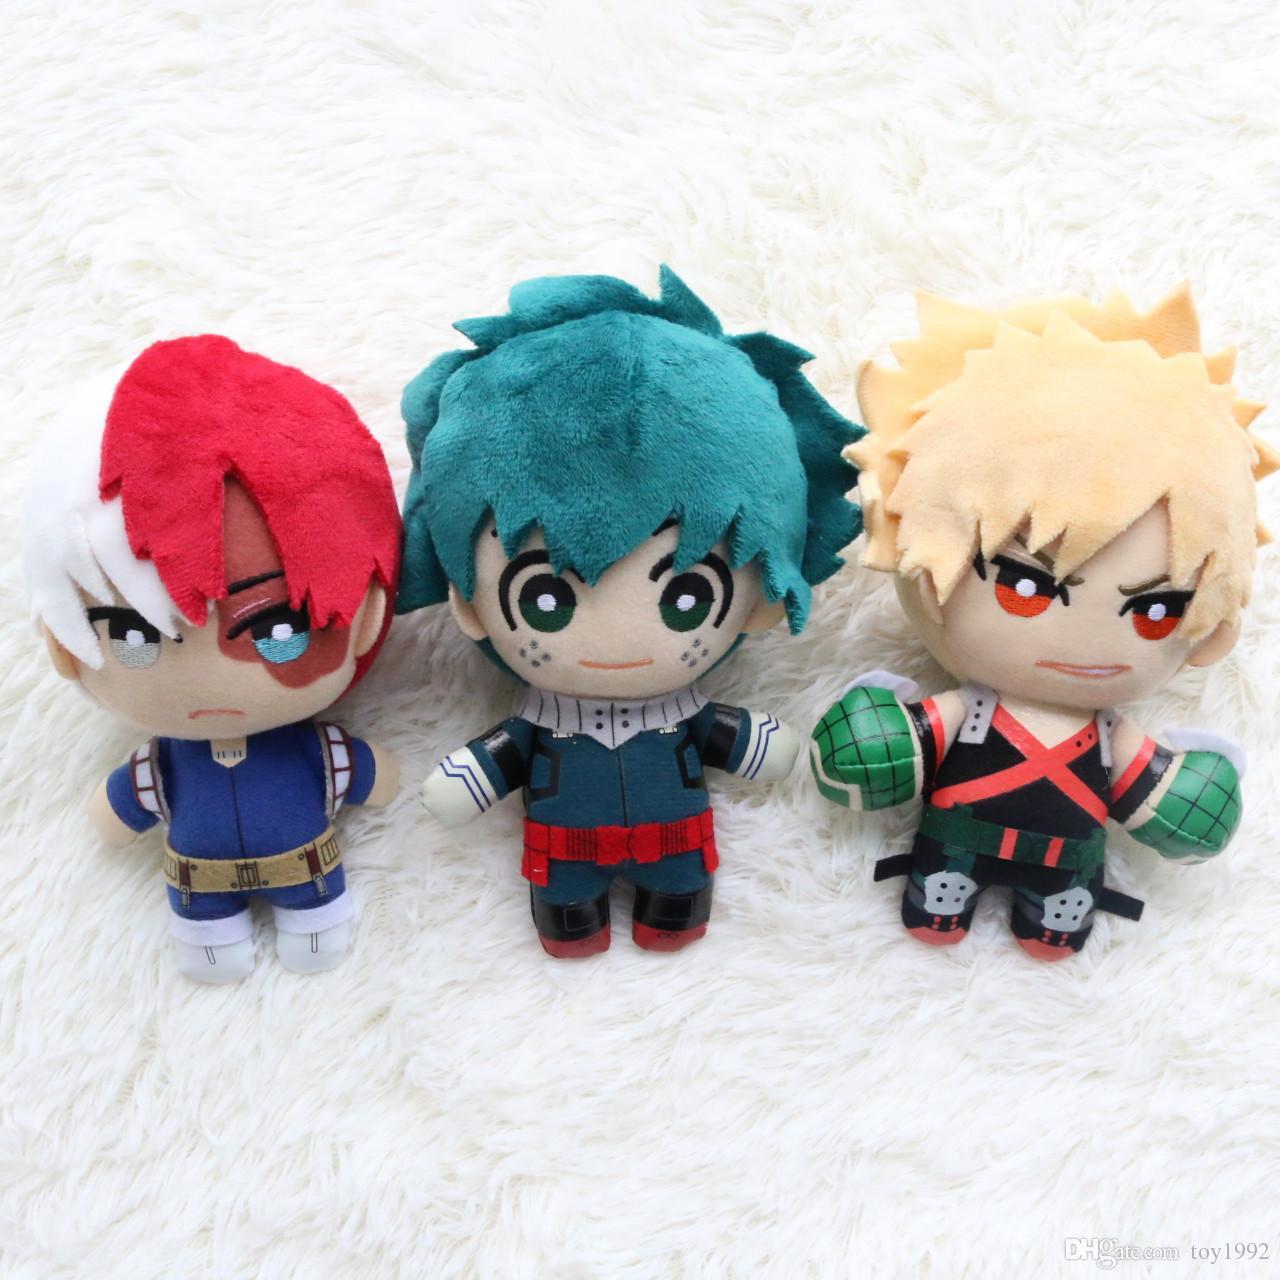 15cm my hero college anime plush toy Boku Yoh Asakura Katsuki Bakugo Shoto Todoroki doll plush toy girl soft gift